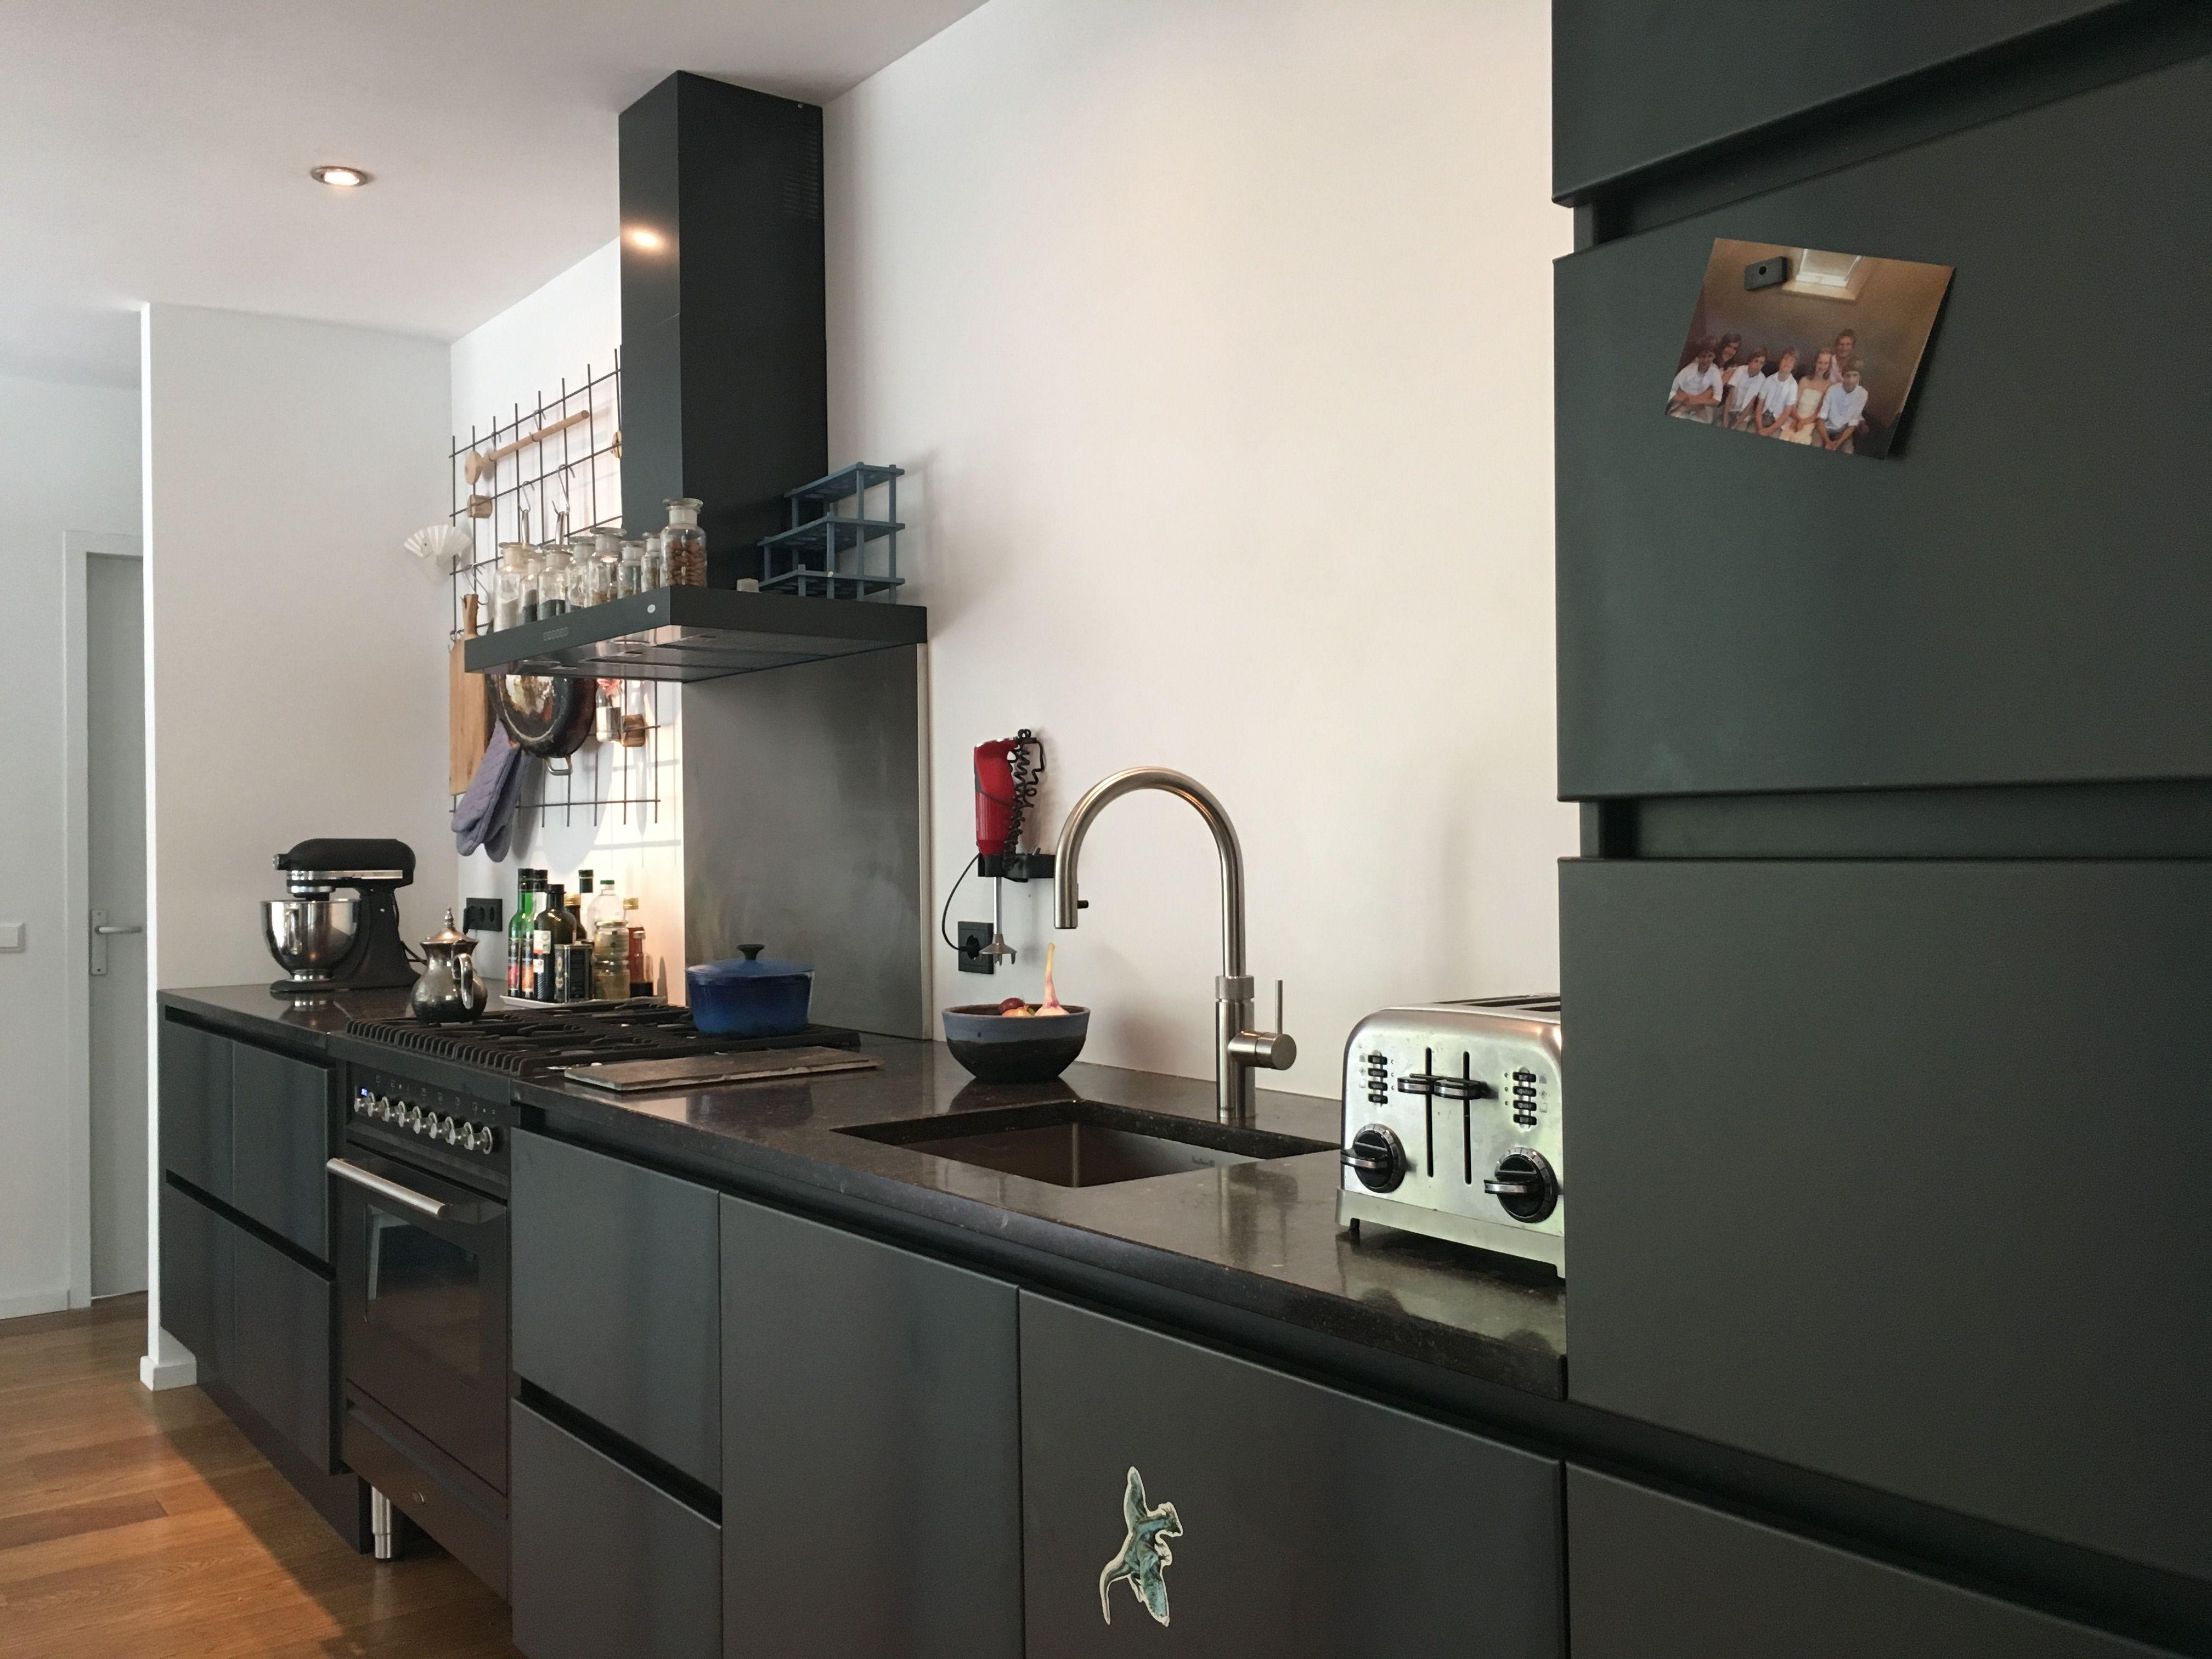 Zwart Keuken Fornuis : Blauwstaal zwarte keuken matzwart stalen keukenkastjes